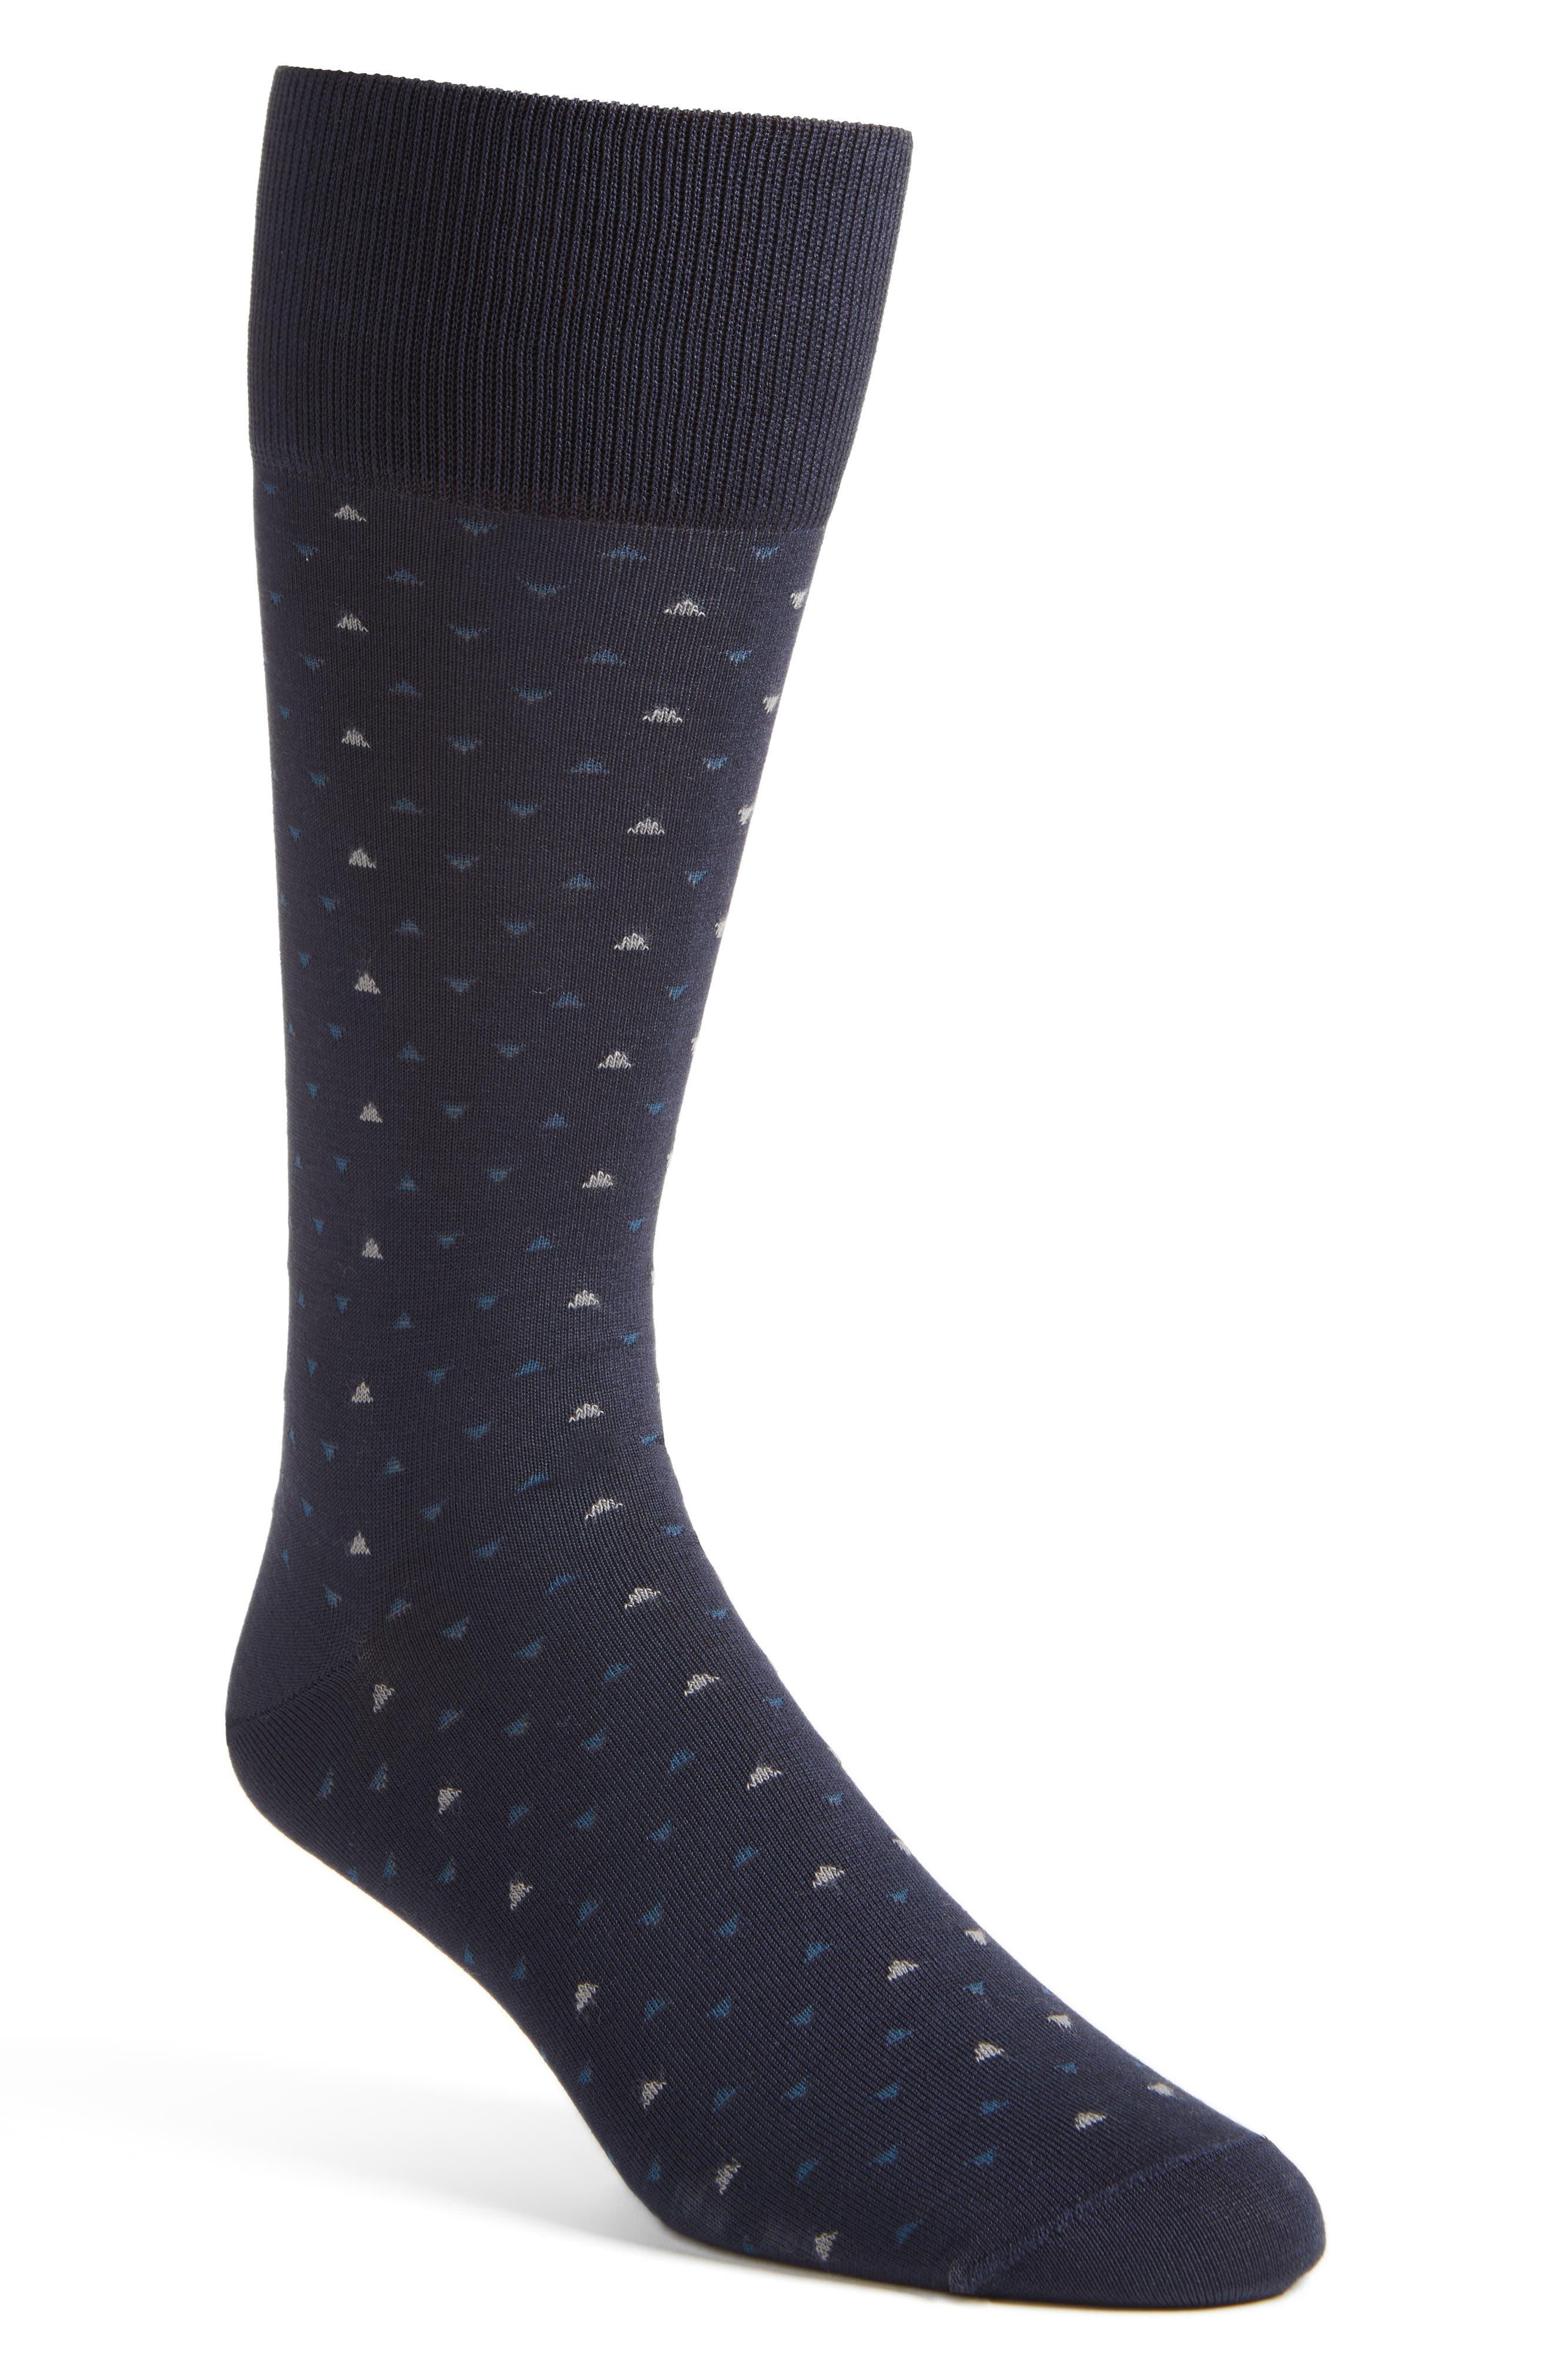 John W. Nordstrom® Over the Calf Cascading Triangles Socks